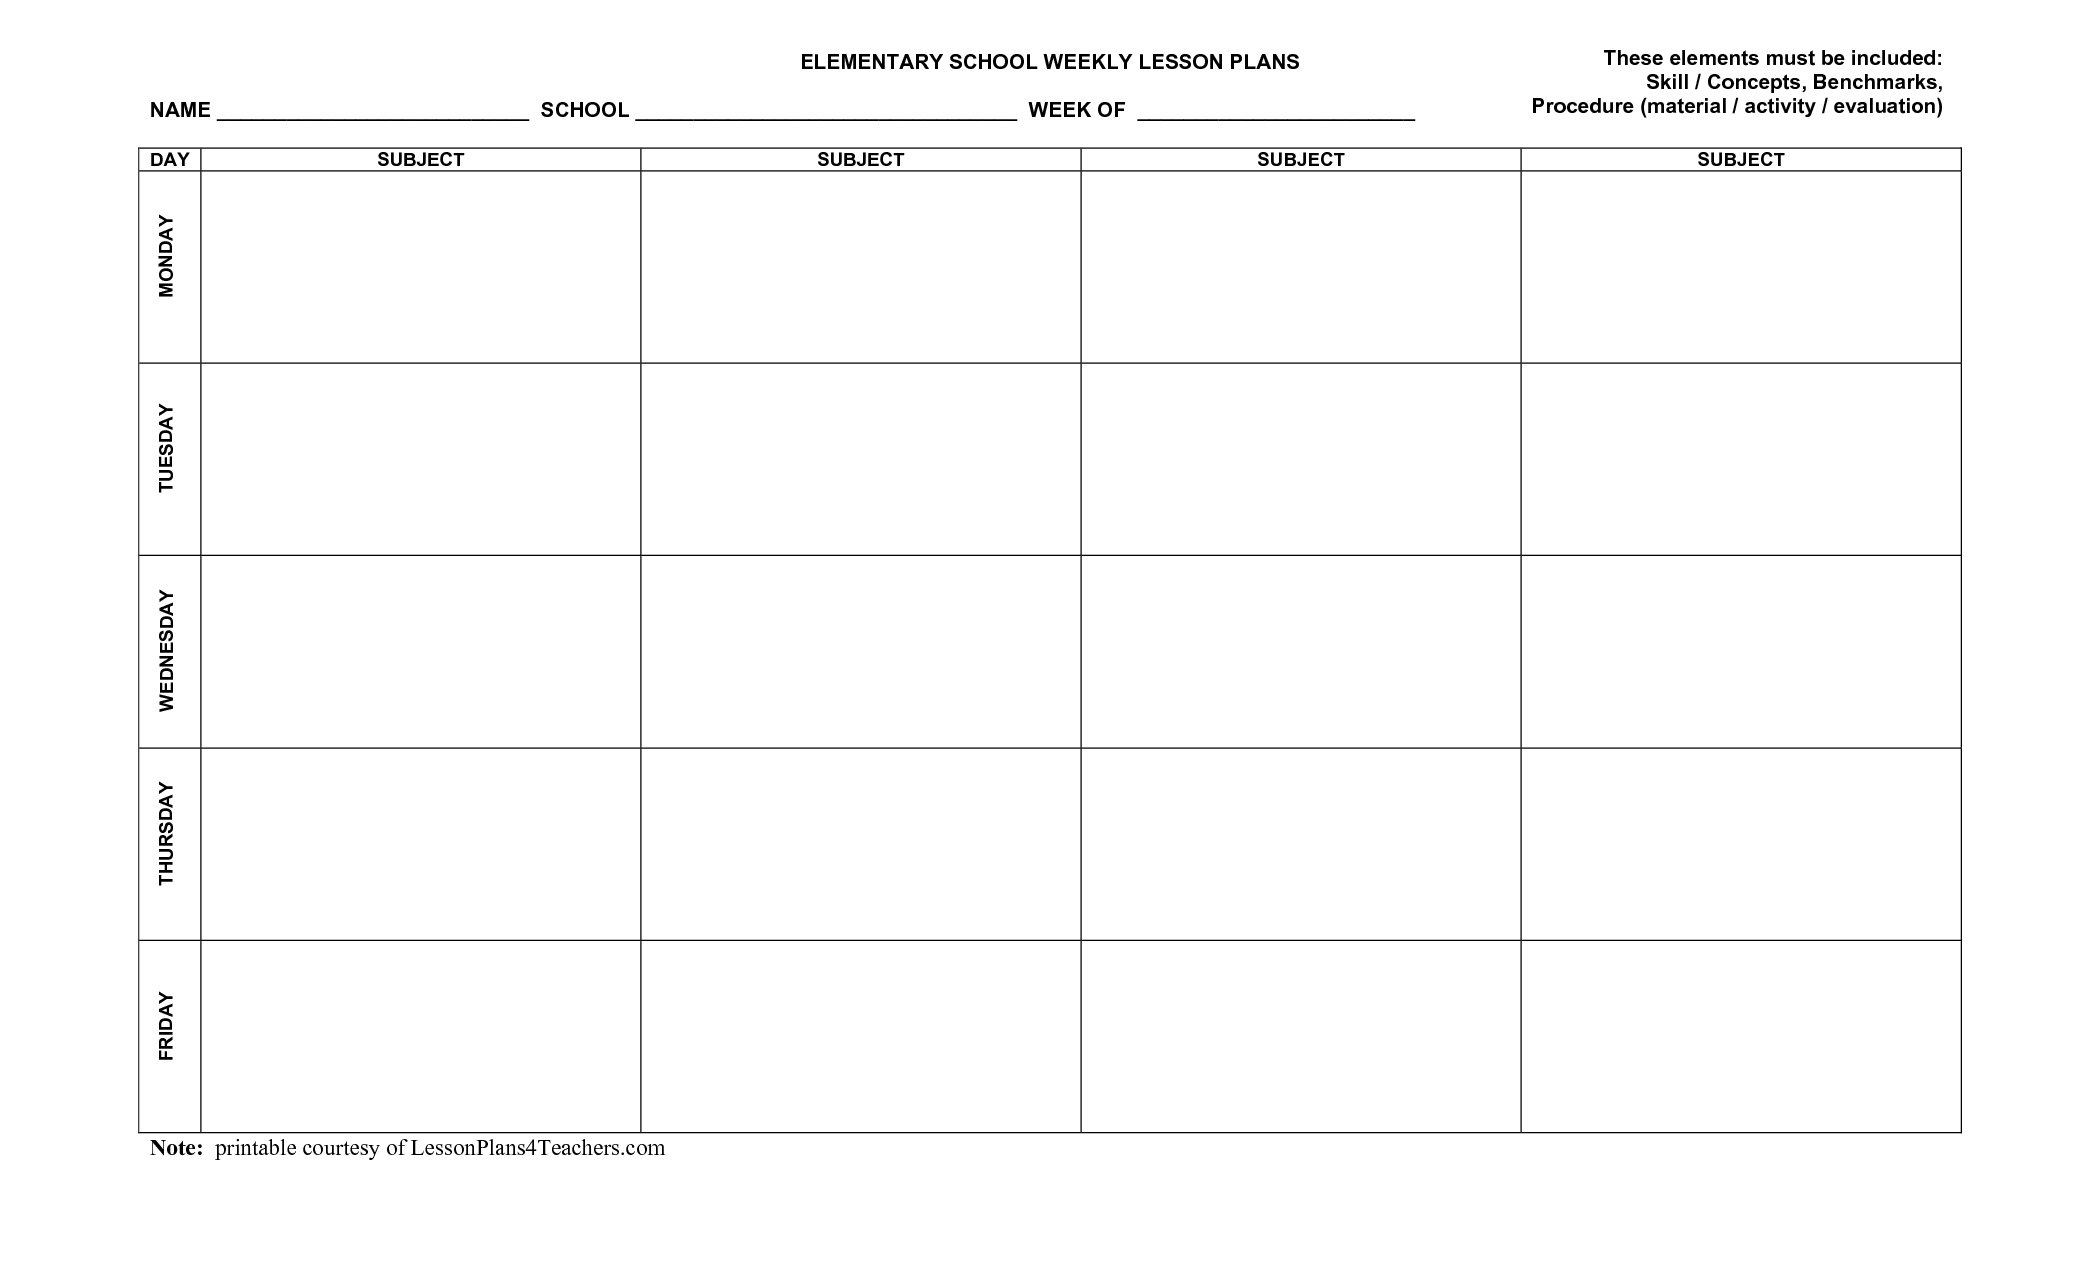 Pinterri Bagby On School Activities | Weekly Lesson Plan